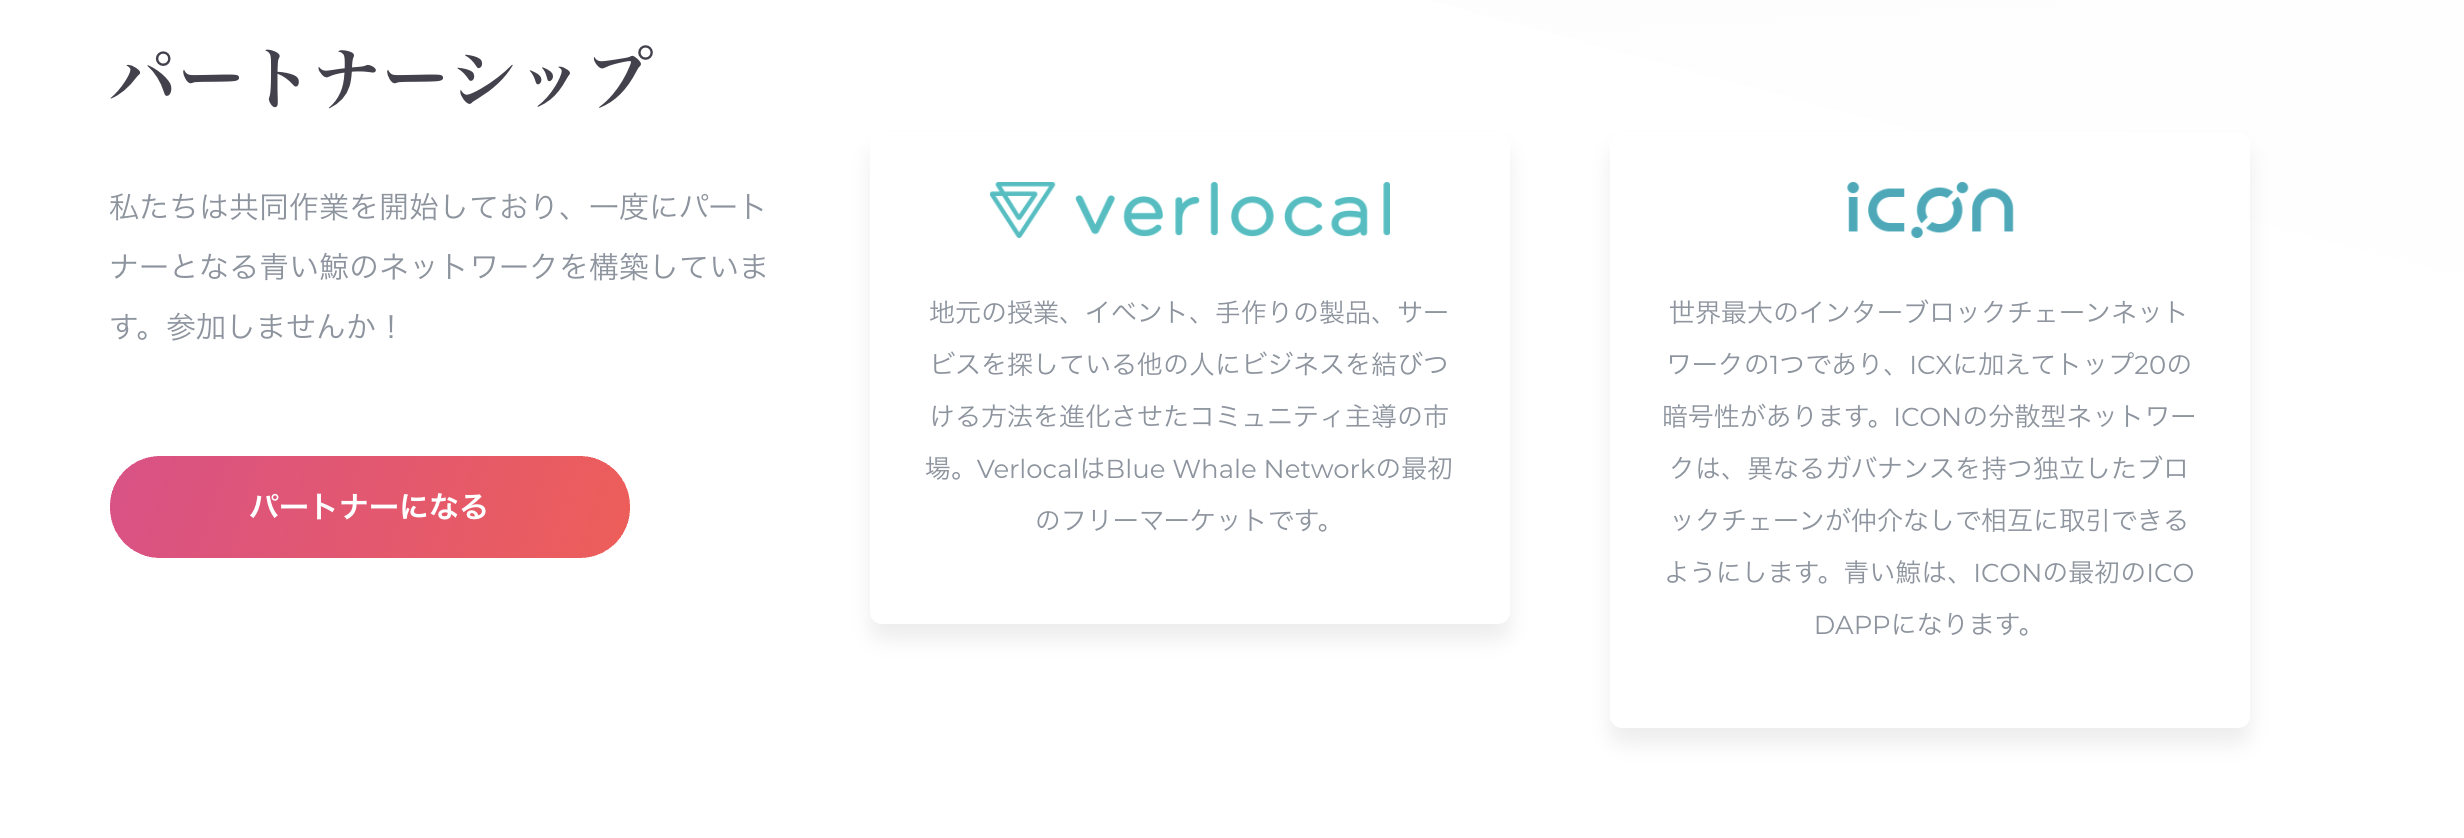 Blue Whale(ブルーホエール) Verlocal ICON(ICX) パートナー